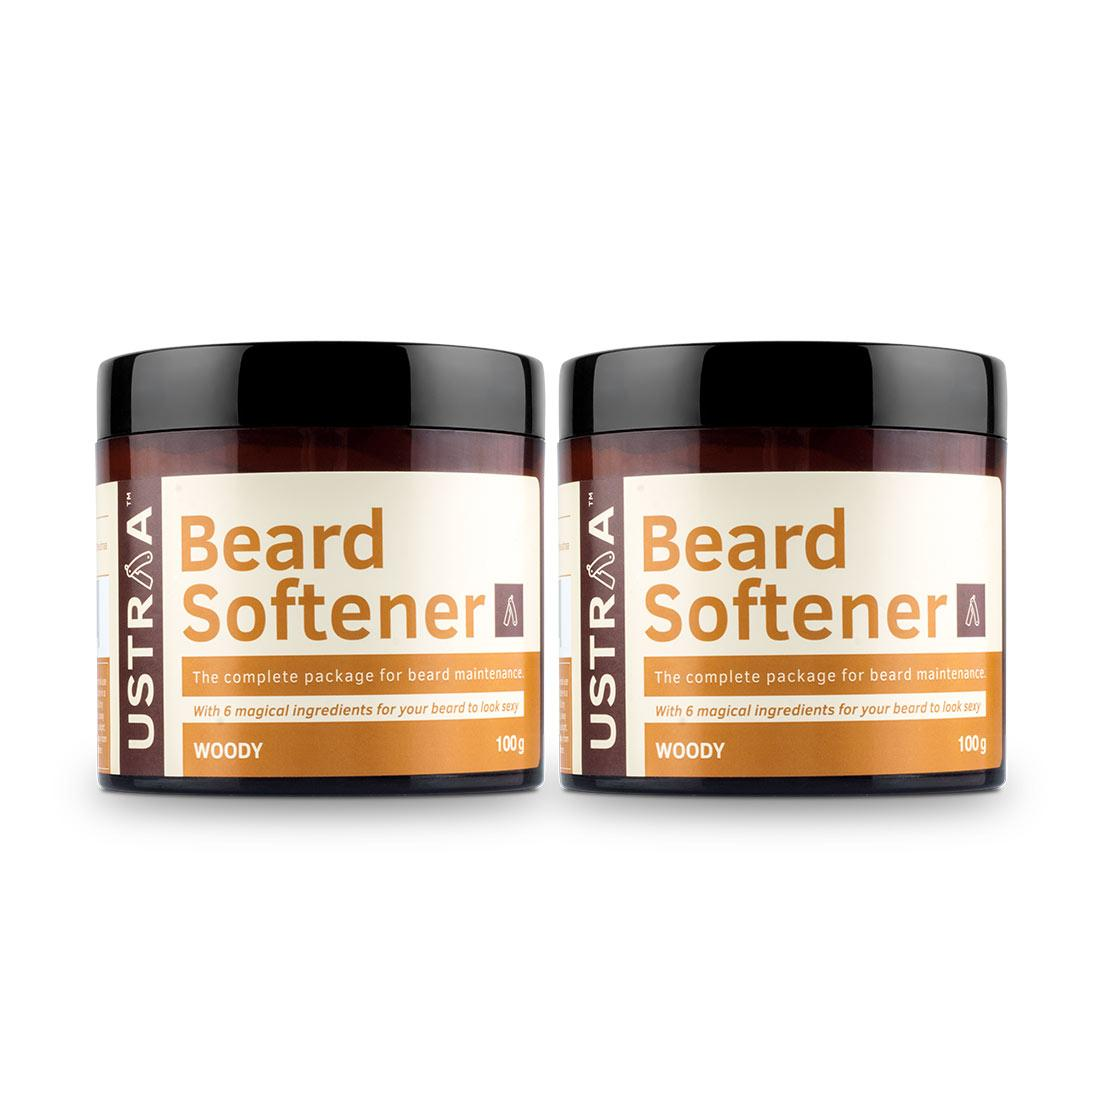 Beard Softener Woody - 100g - Set of 2